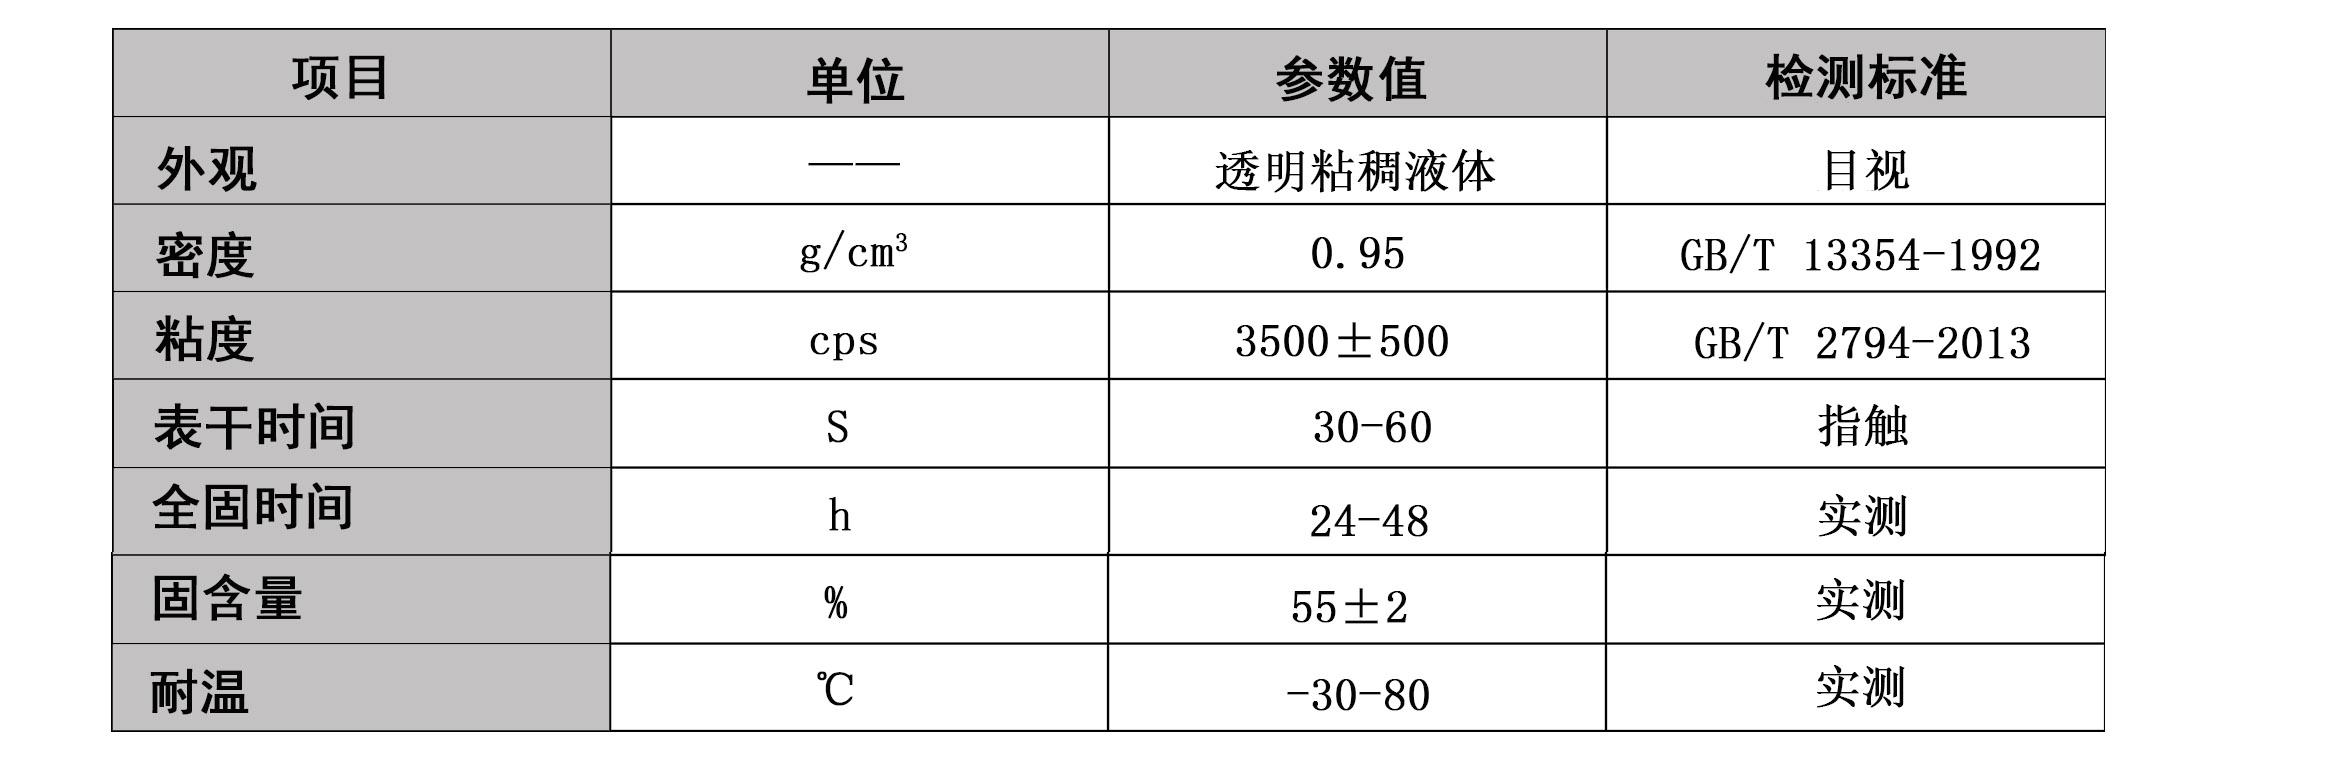 PVC搪胶专用胶水-PVC搪胶胶水